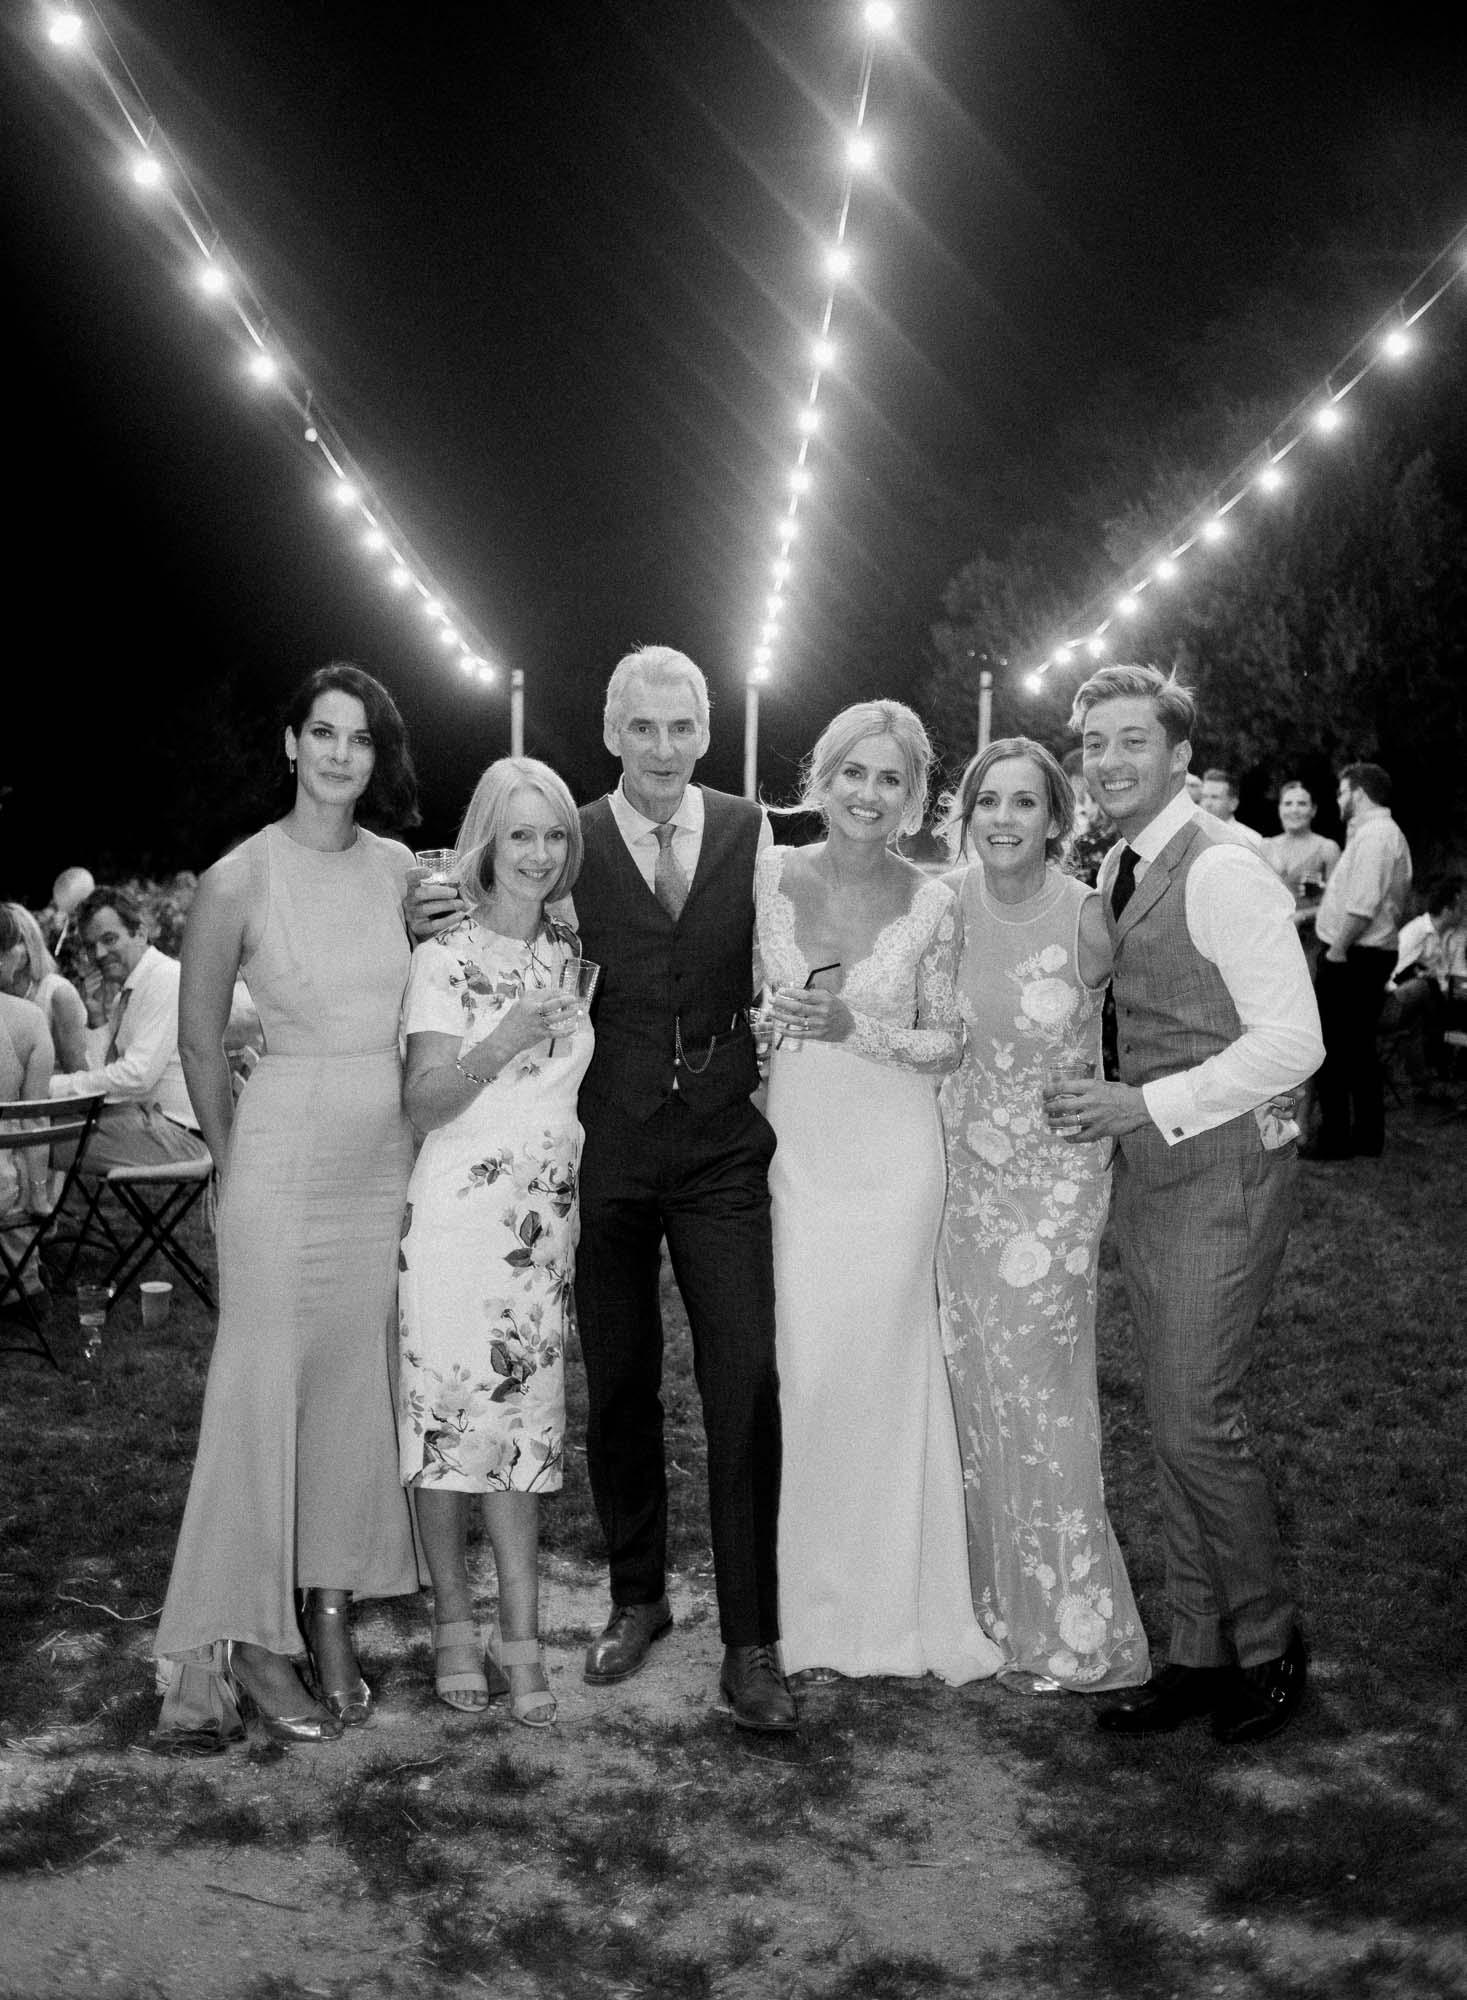 gascony_french_wedding-85.jpg